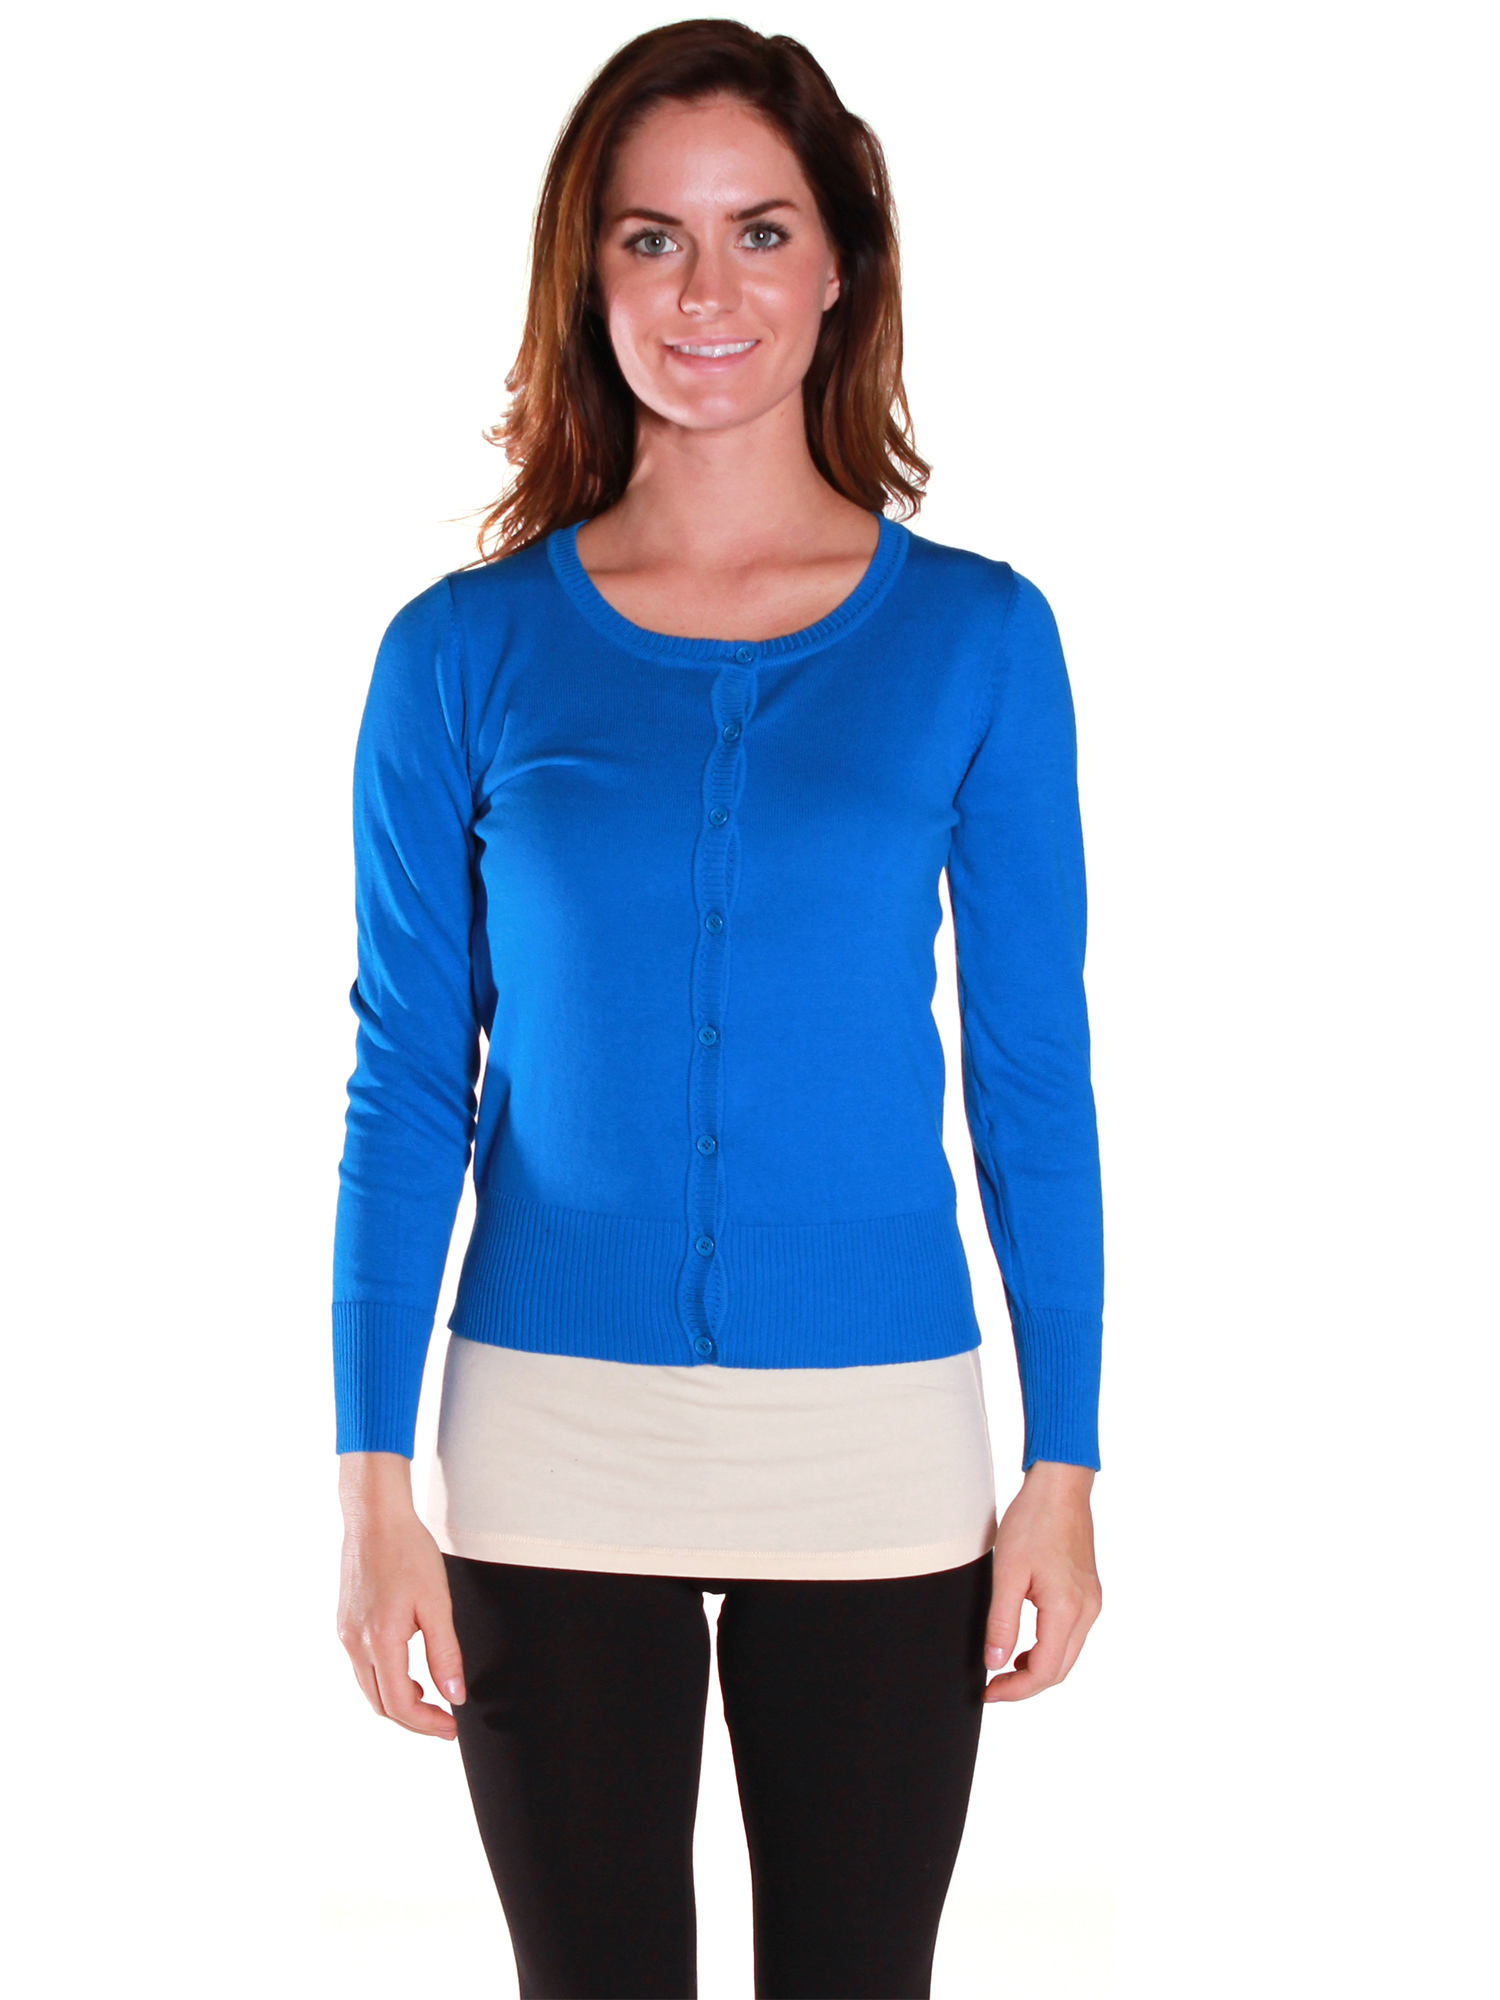 Active USA Junior Women's Knit Basic Round Neck Cardigan Sweater - Junior and Plus Sizes